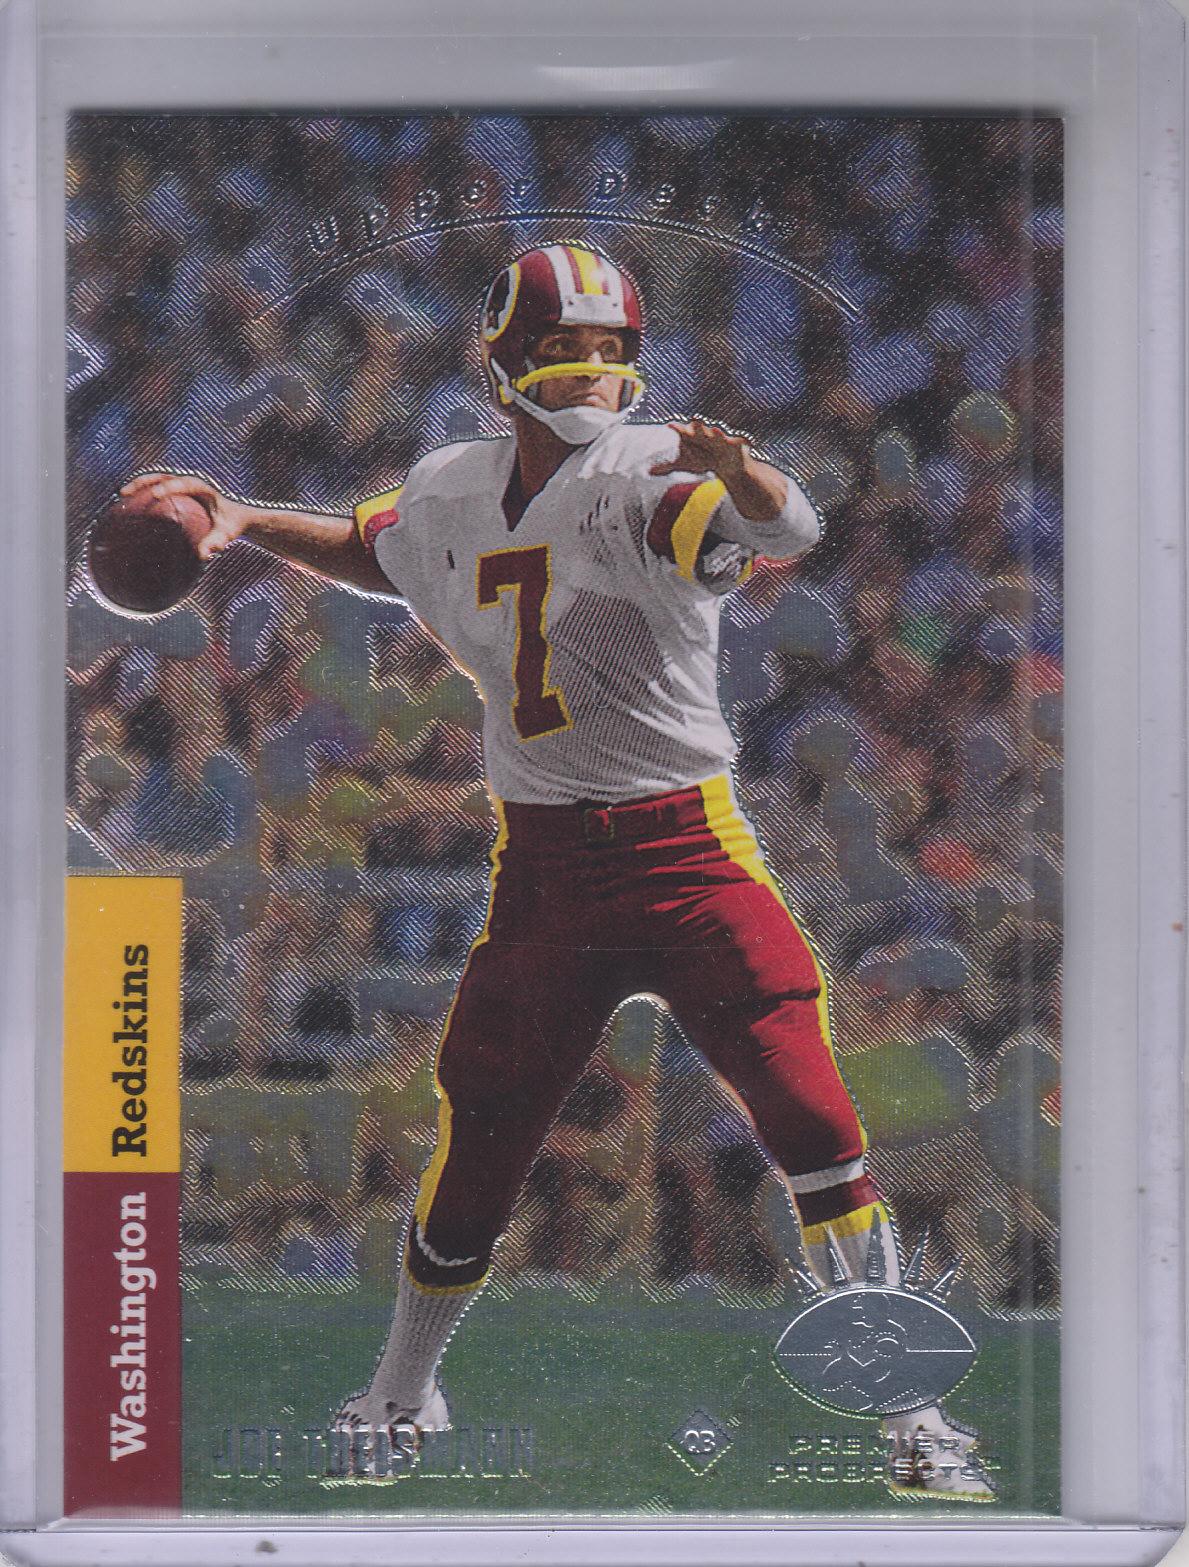 2008 SP Rookie Edition #414 Joe Theismann 93